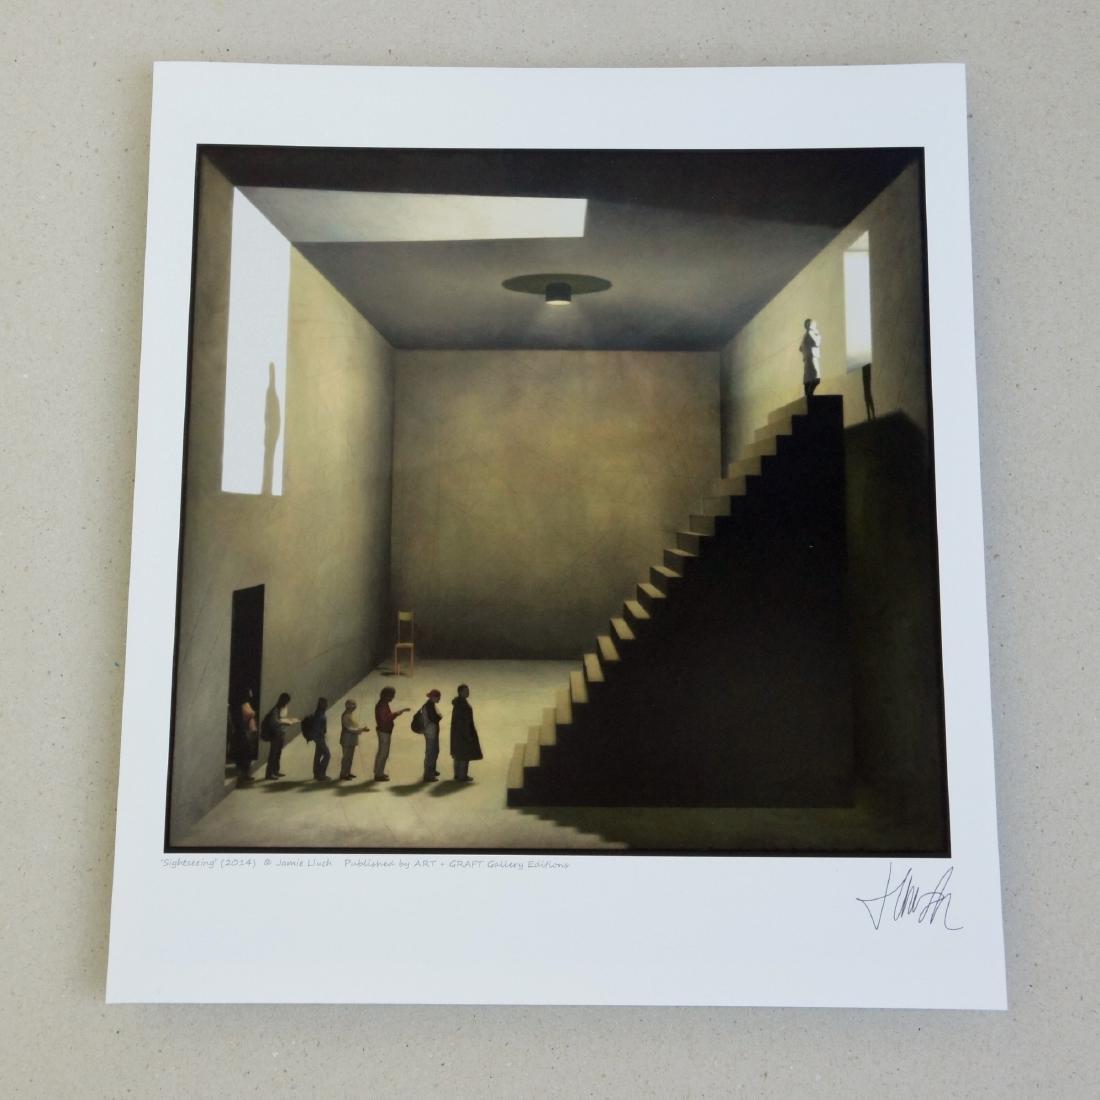 Jamie Lluch - Print - Sightseeing - 2